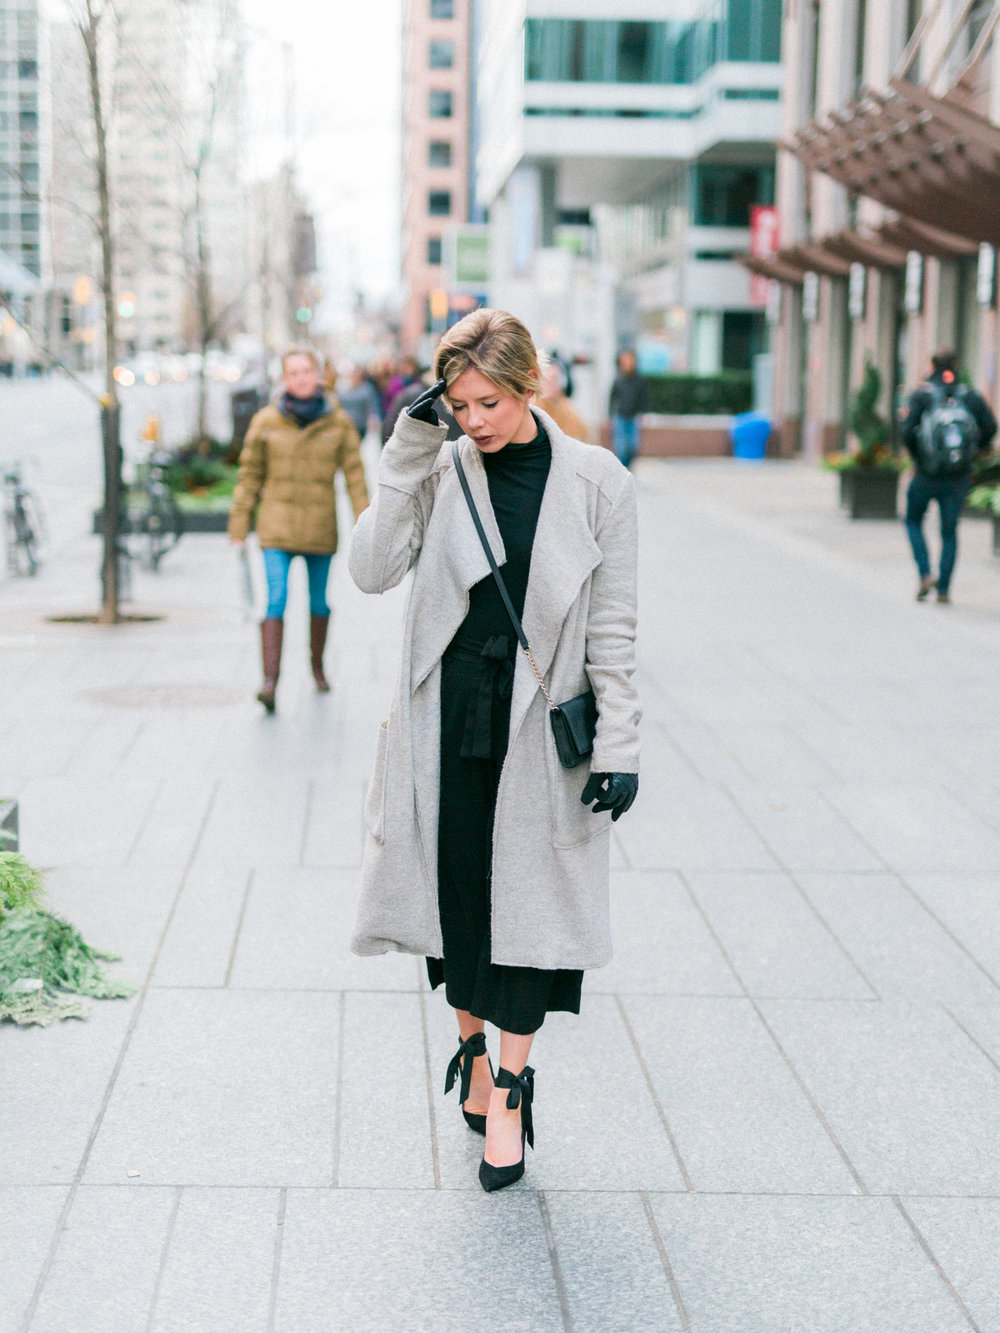 DanielleGirouxPhotography_Toronto_Portrait_StreetPhotography_0C6A1043.jpg